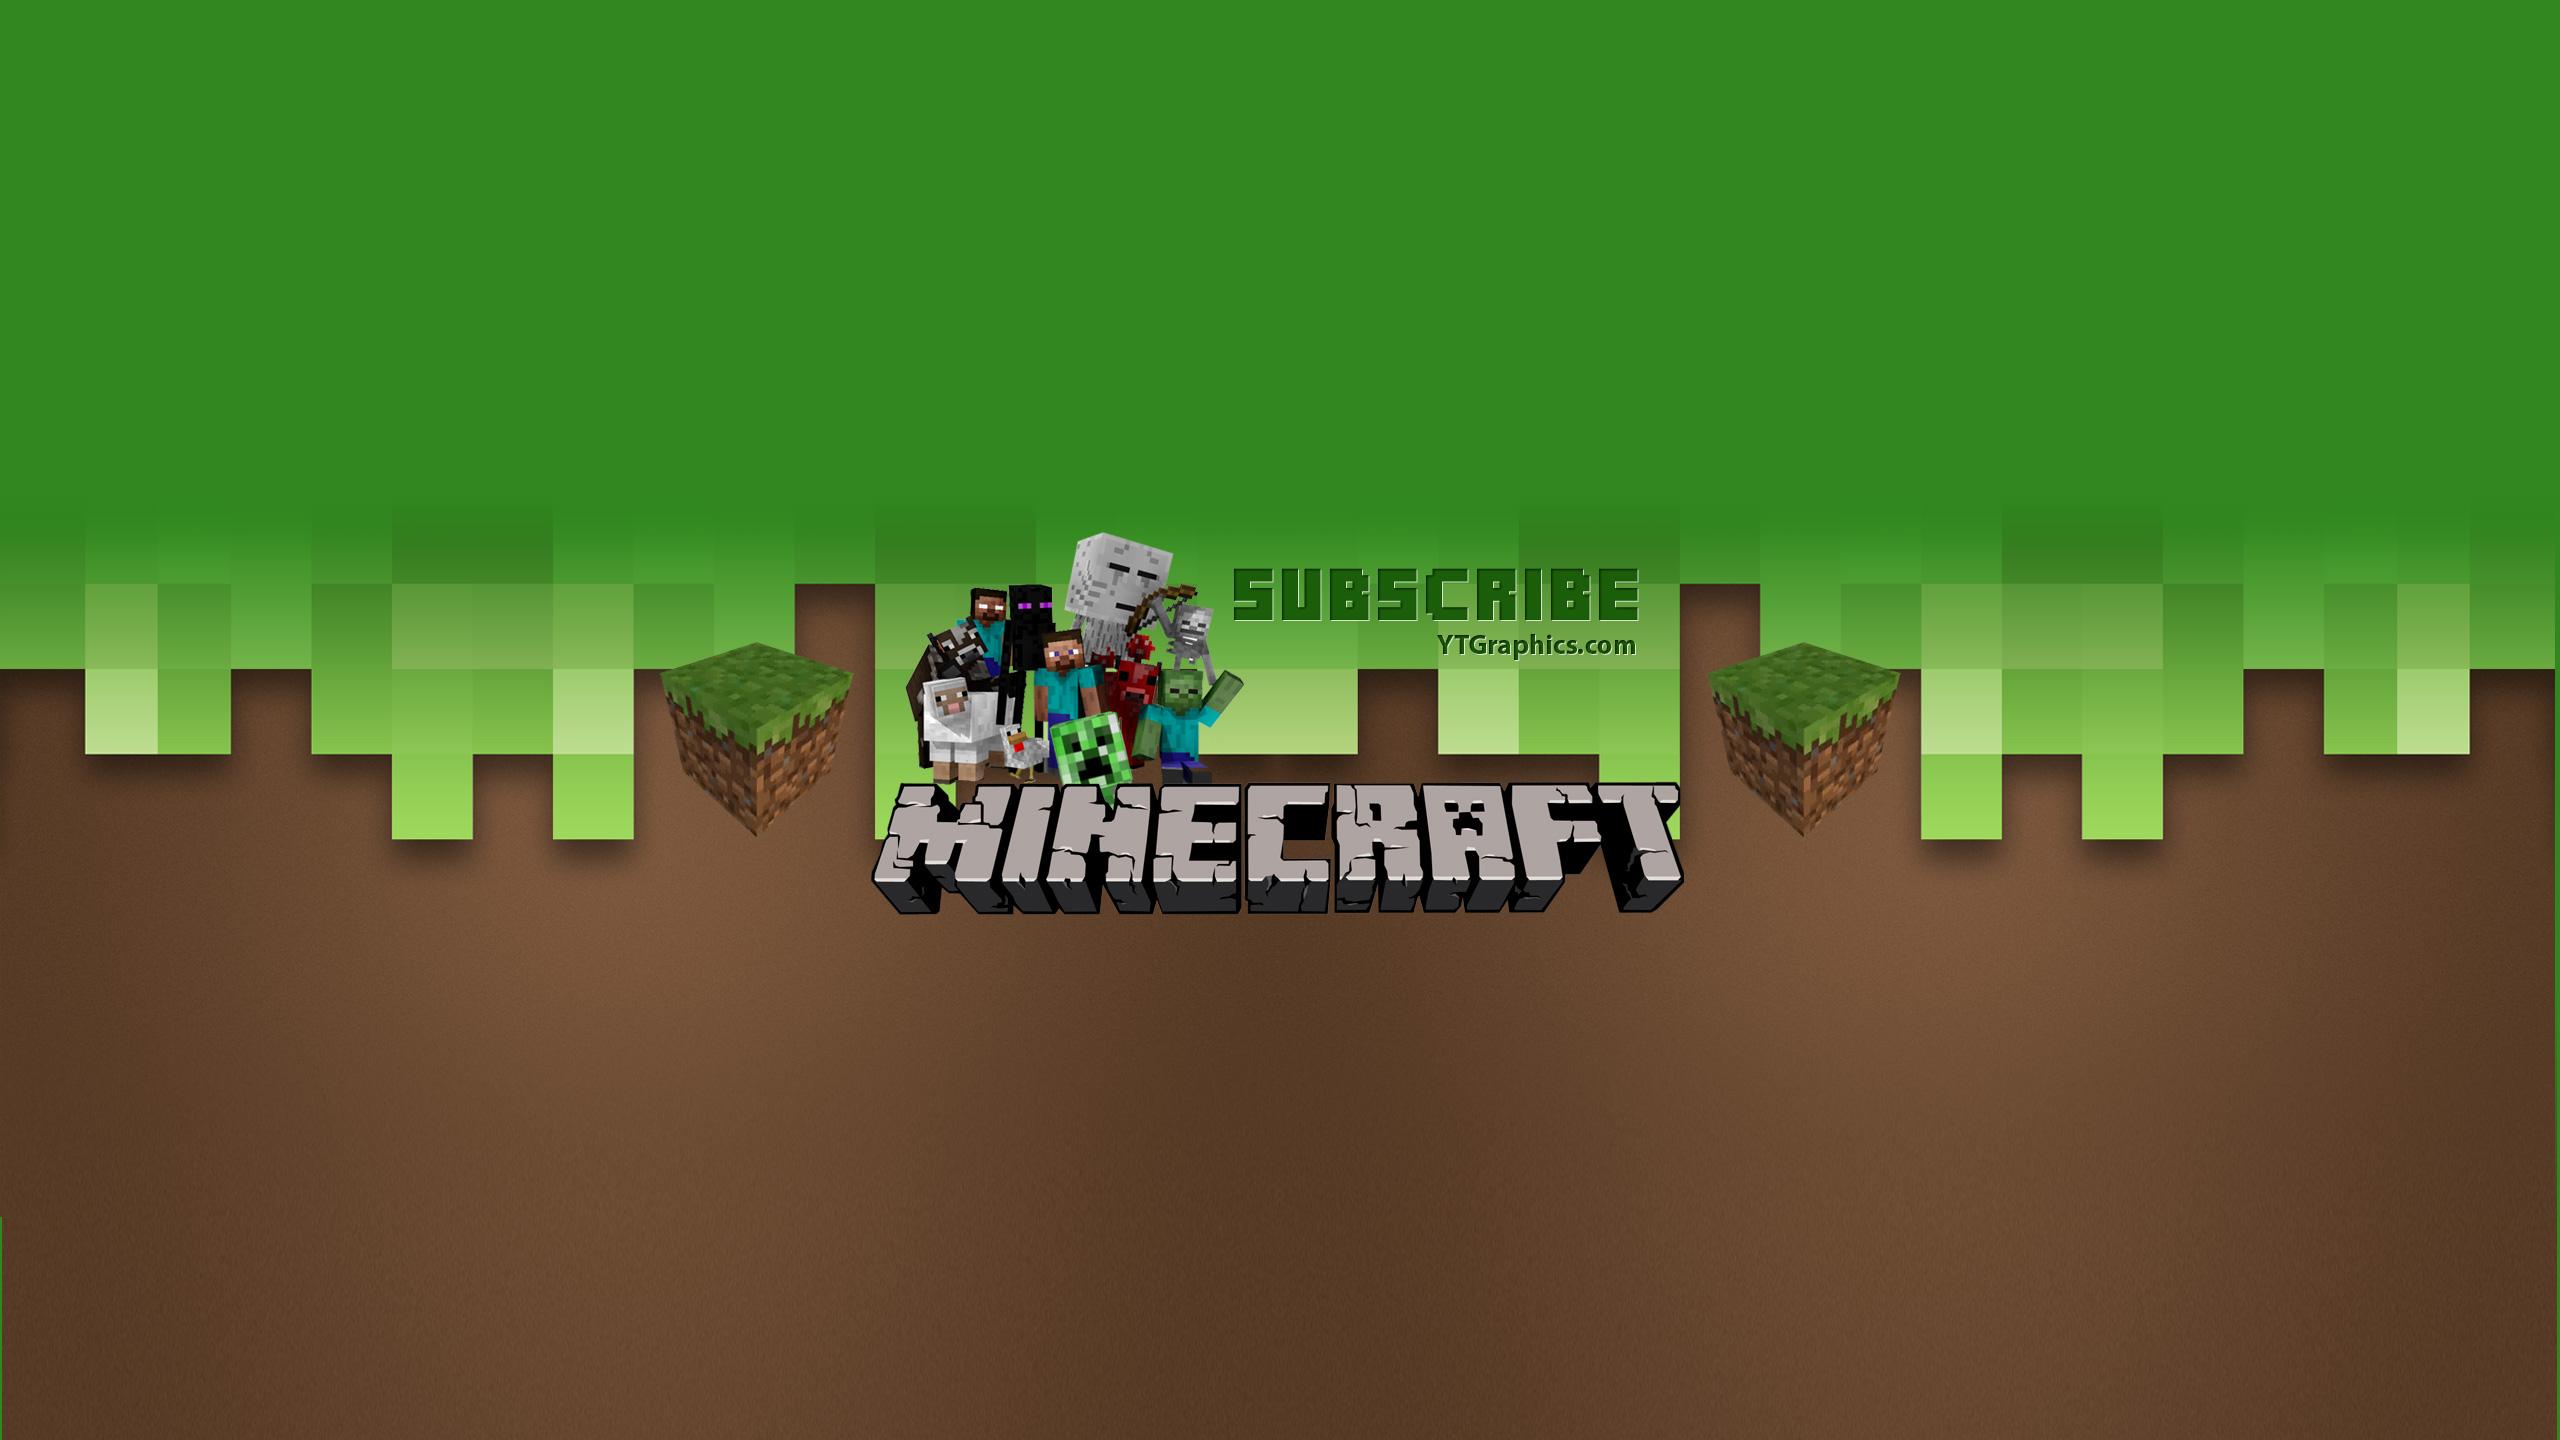 of 2560x1440 Minecraft Wallpaper Creator SC